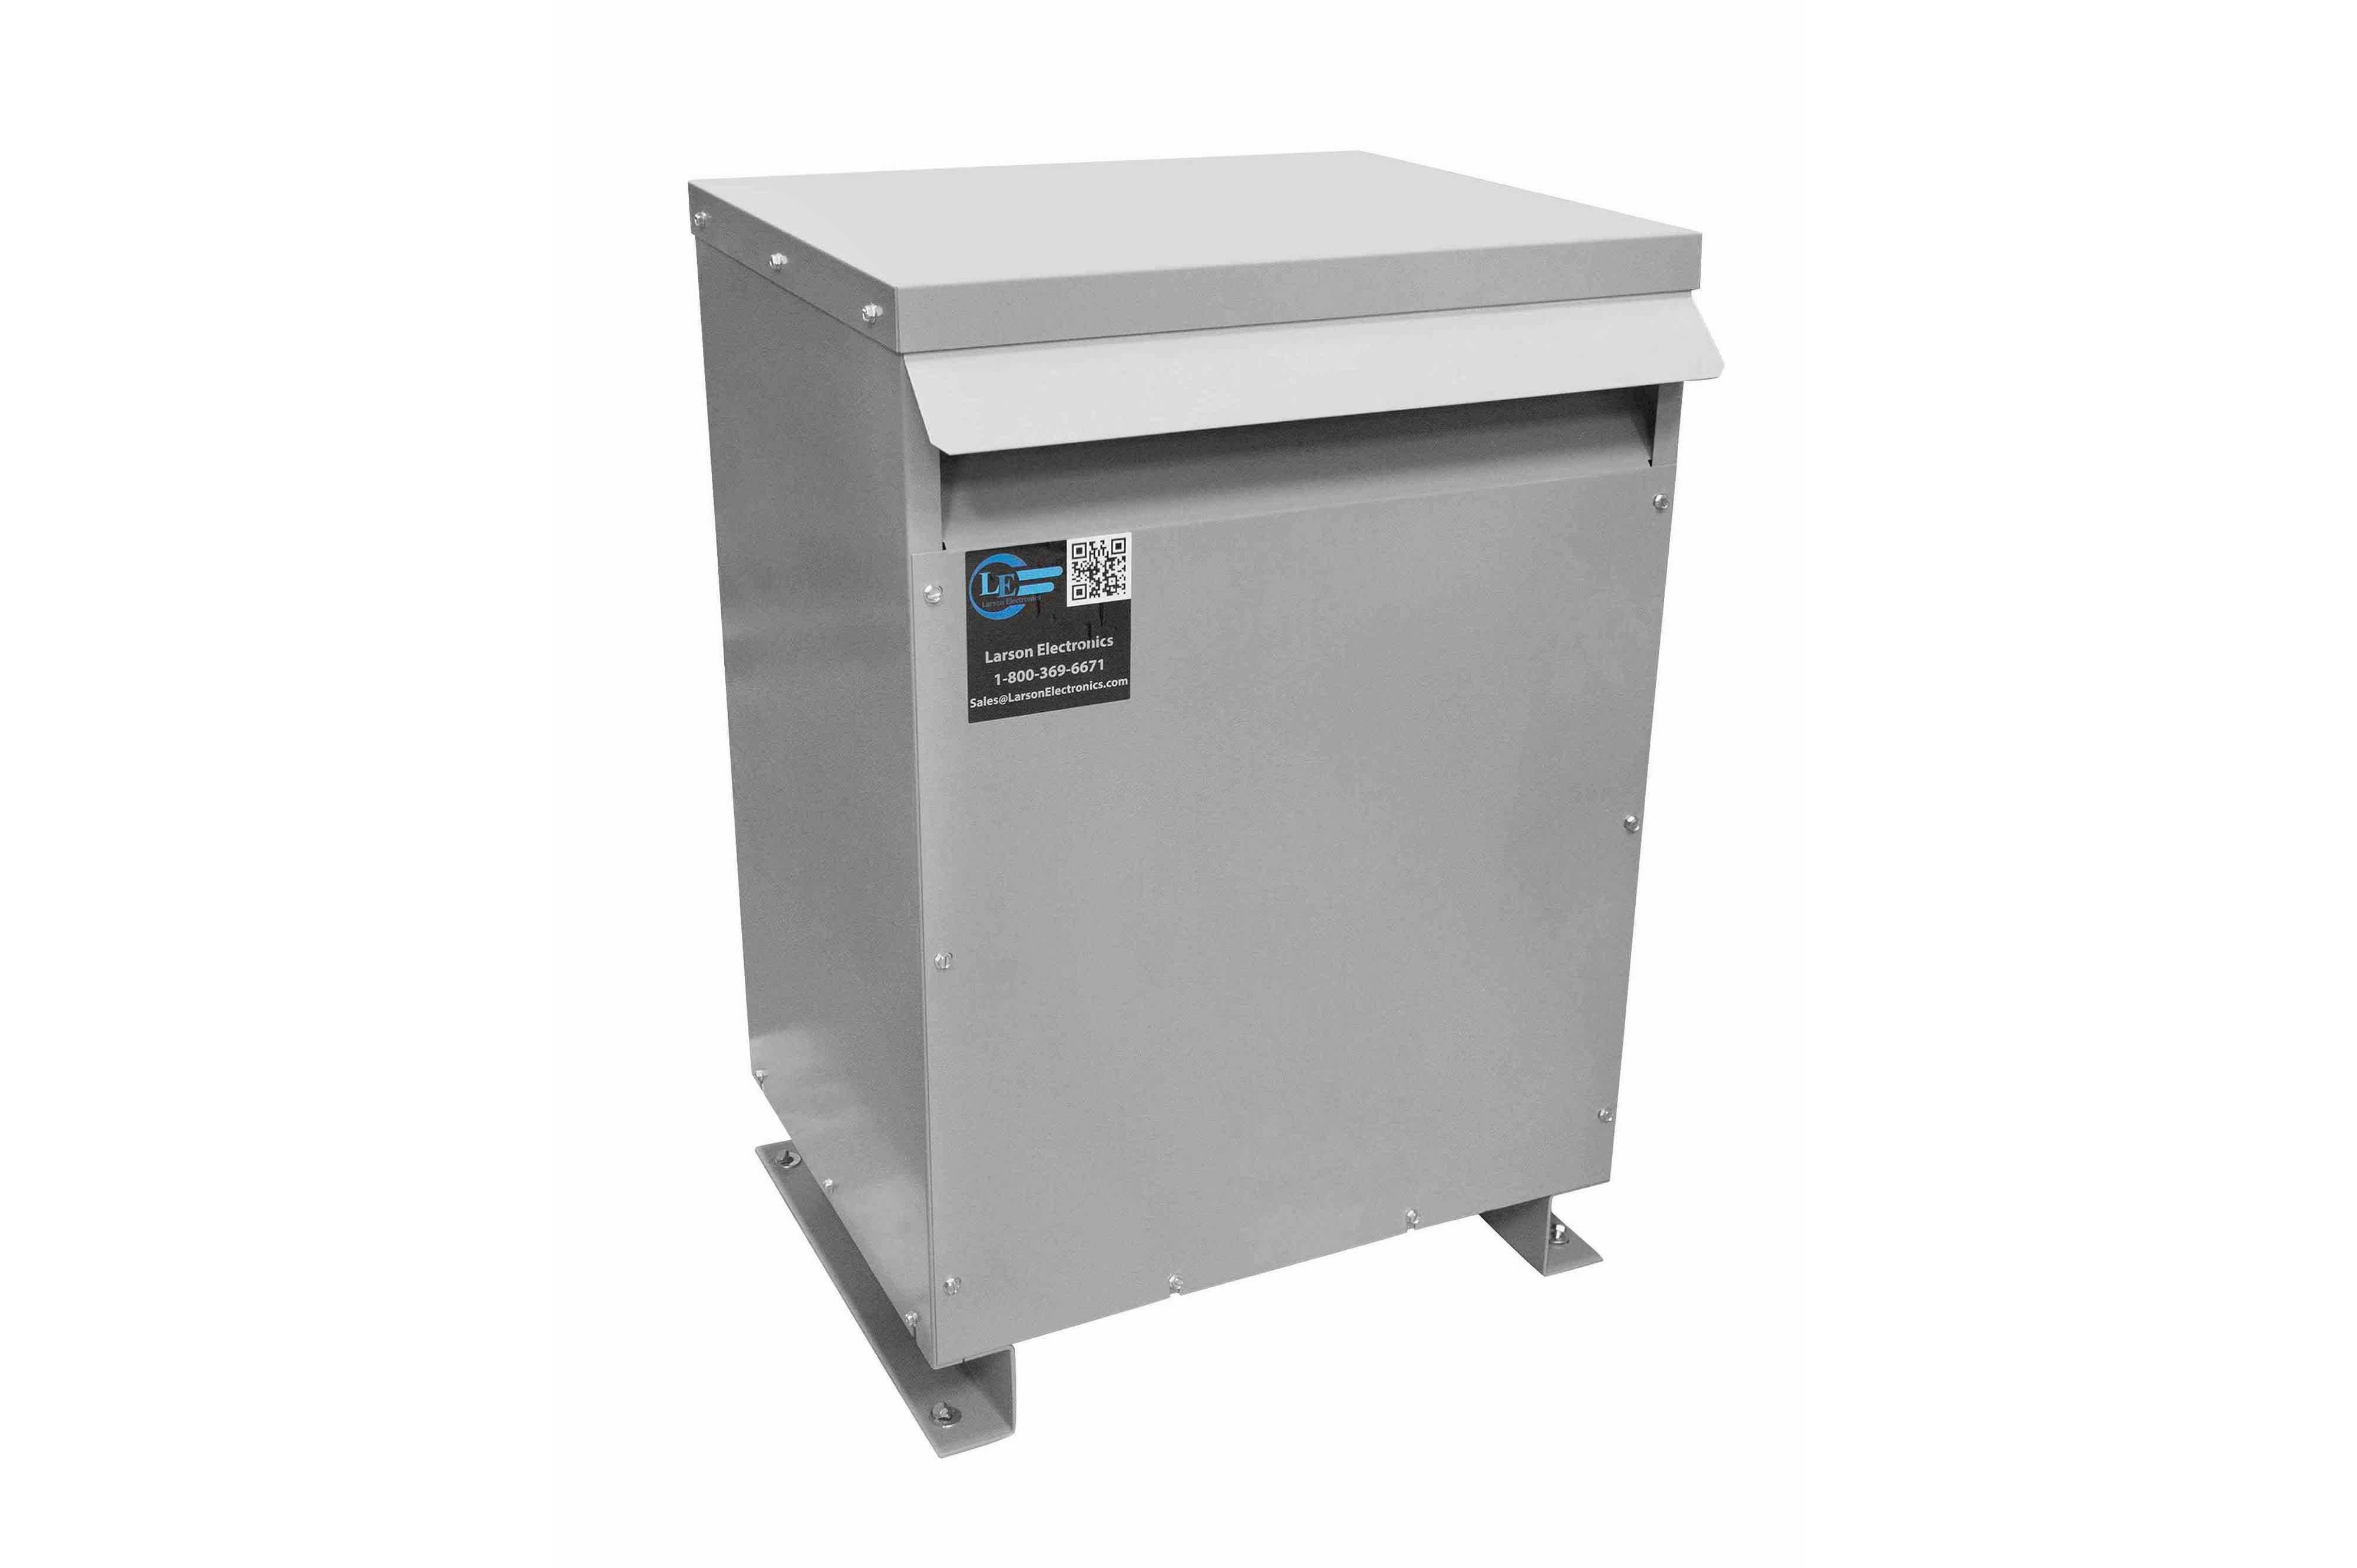 14 kVA 3PH Isolation Transformer, 380V Wye Primary, 208Y/120 Wye-N Secondary, N3R, Ventilated, 60 Hz